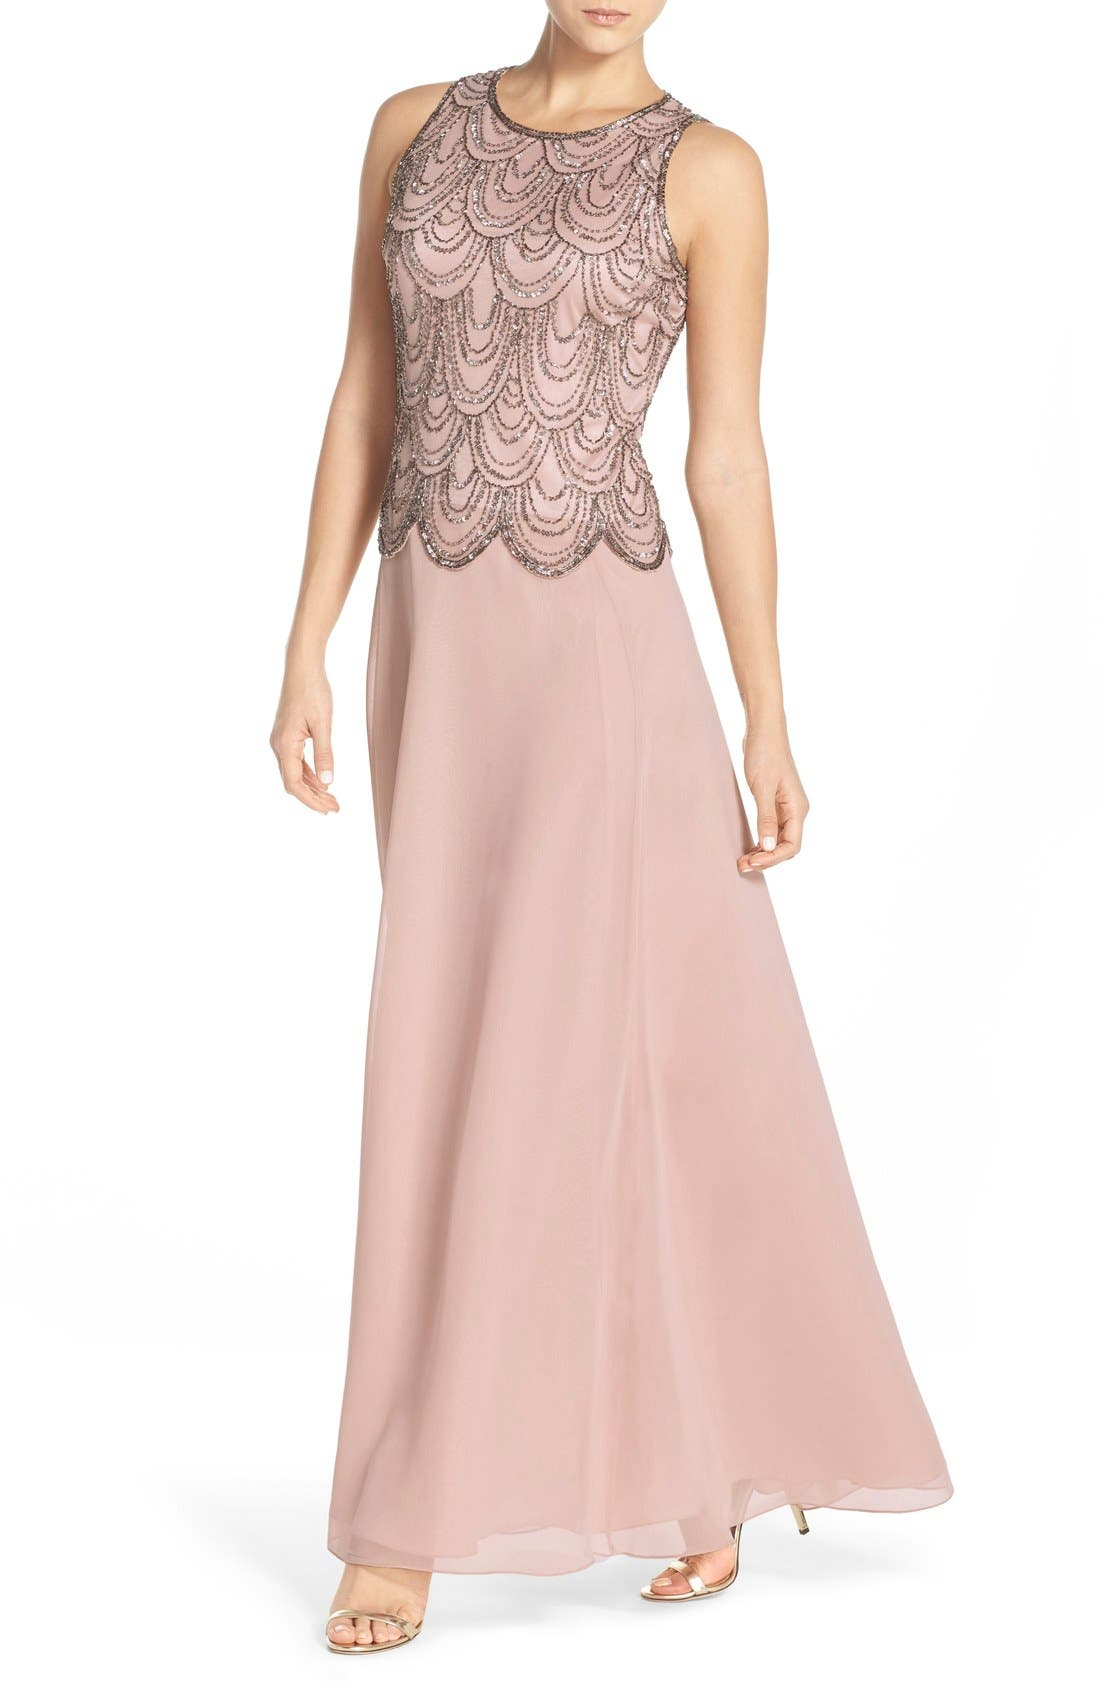 Main Image - J Kara Scallop Embellished Popover Chiffon Gown